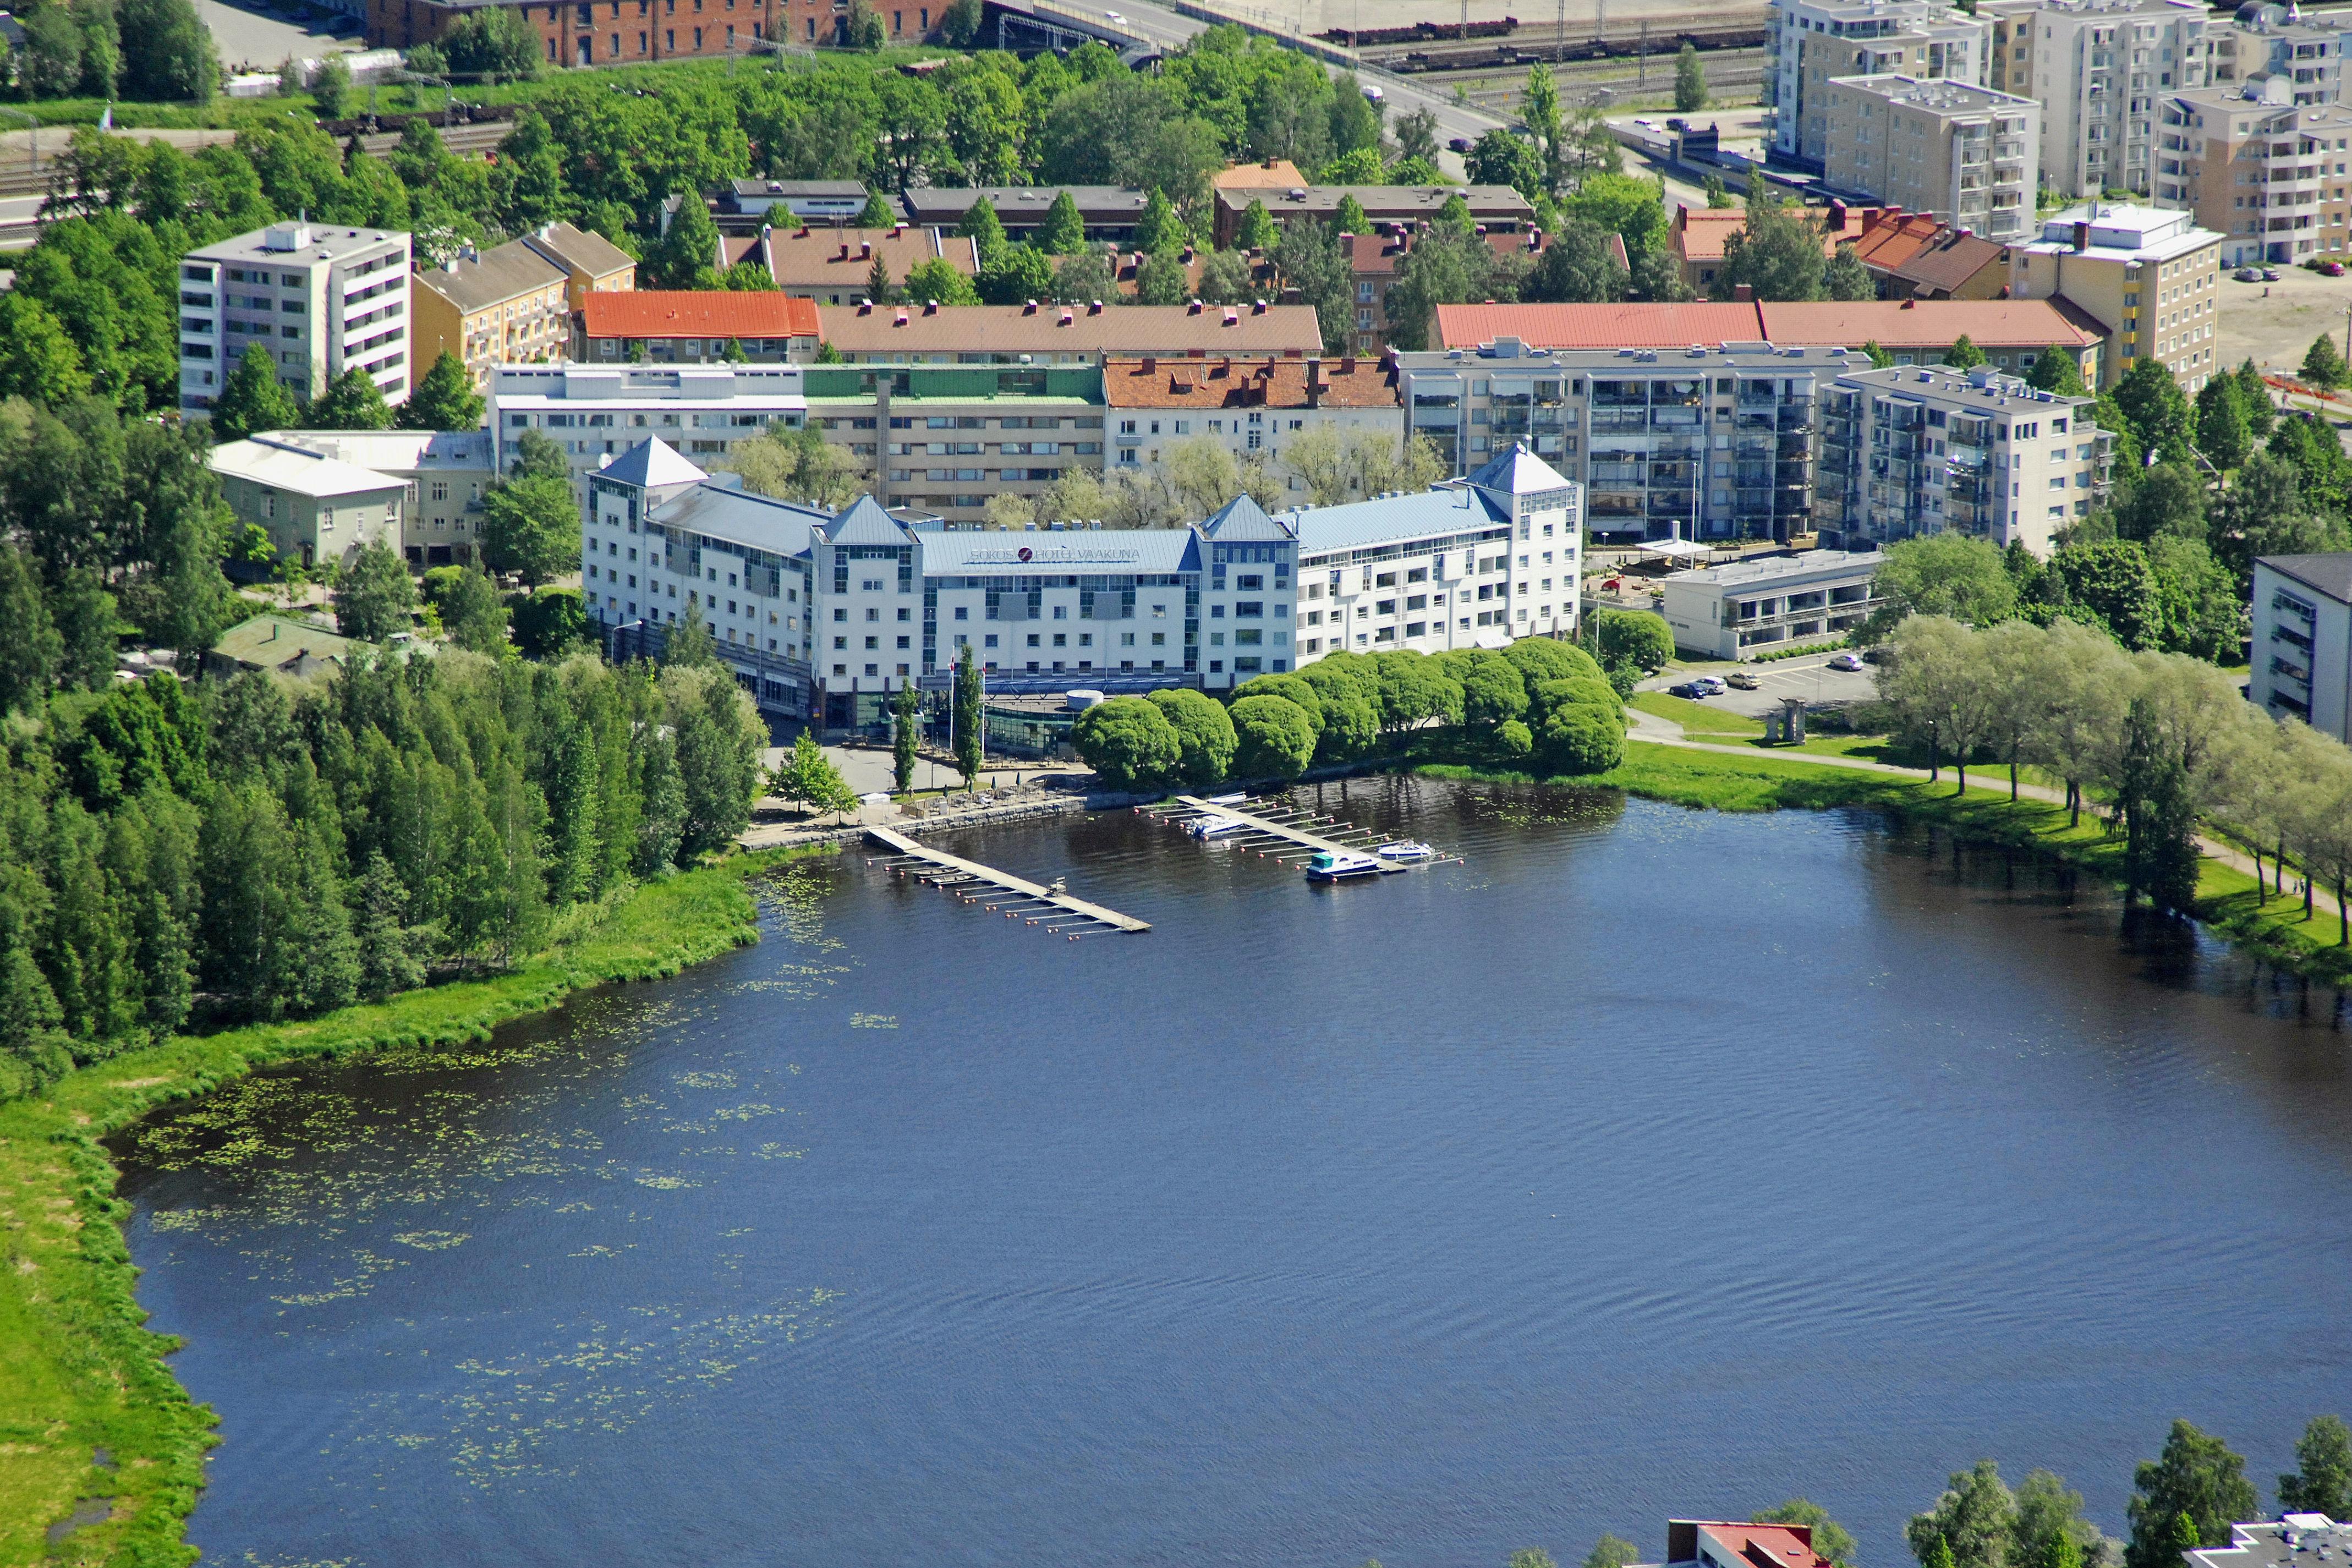 Sokos Hotel Vaakuna Marina In Hameenlinna Finland